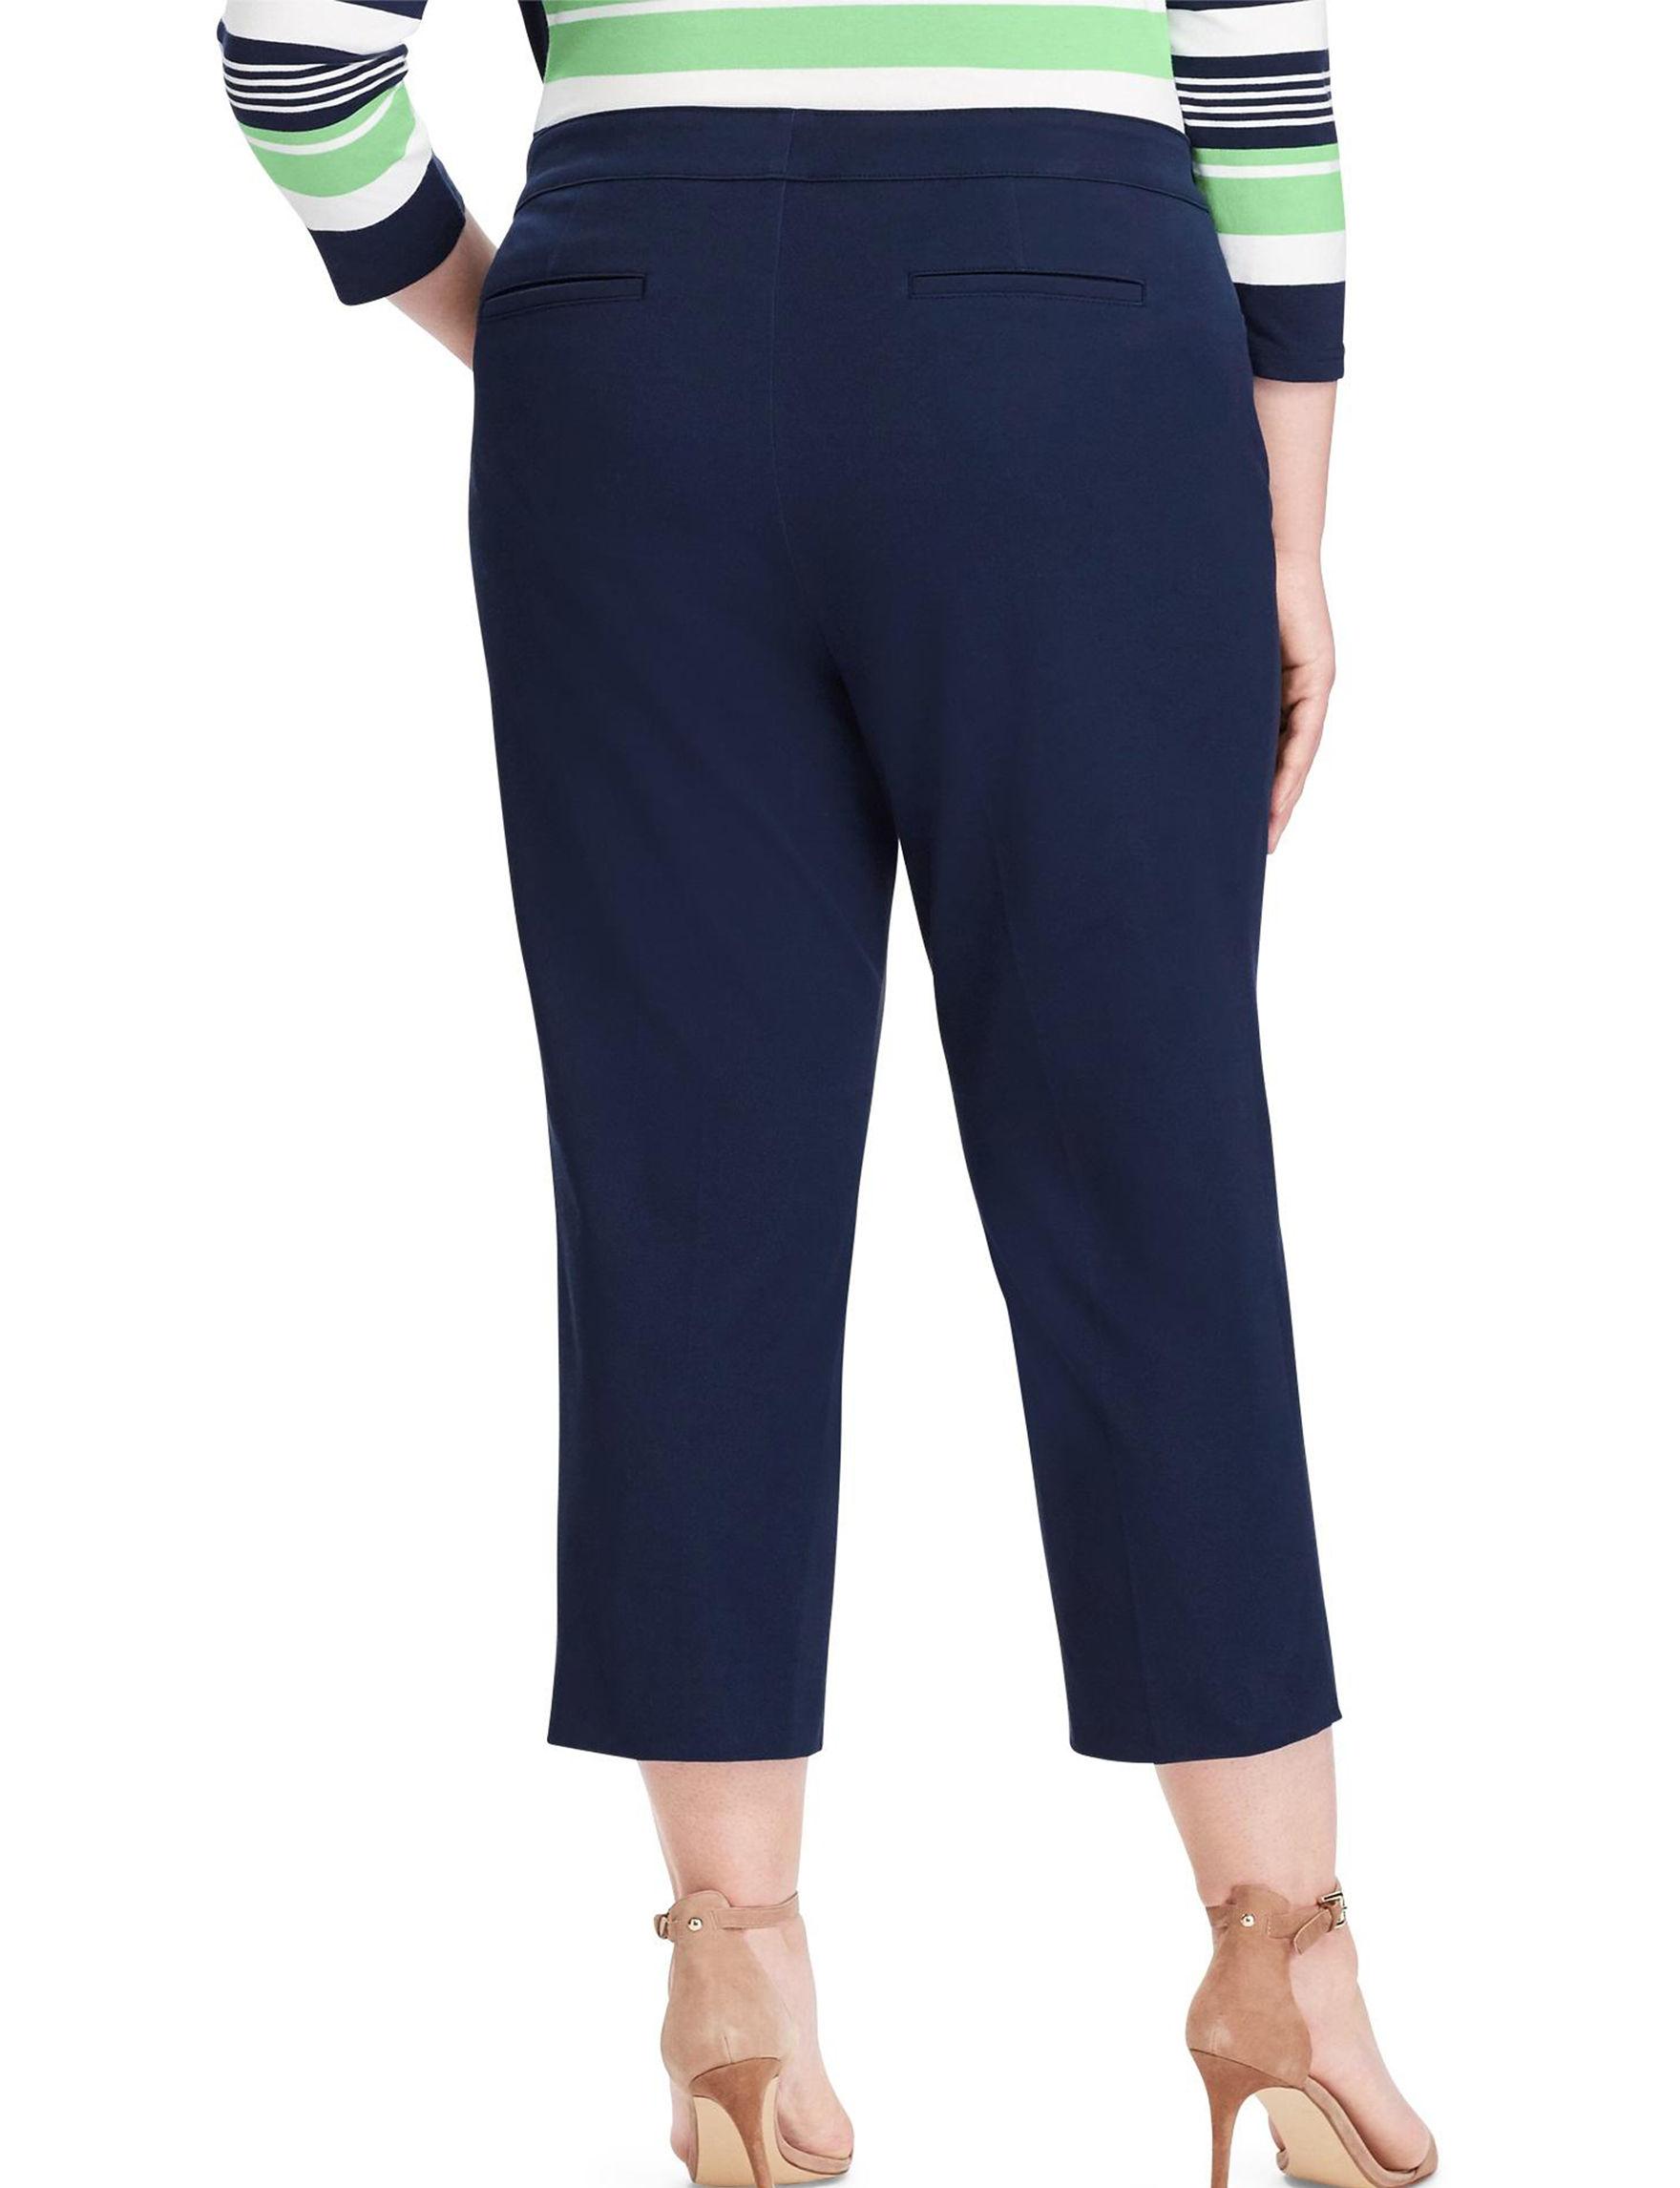 60feb4afef75a Chaps Plus-size Stretch Twill Capri Pants